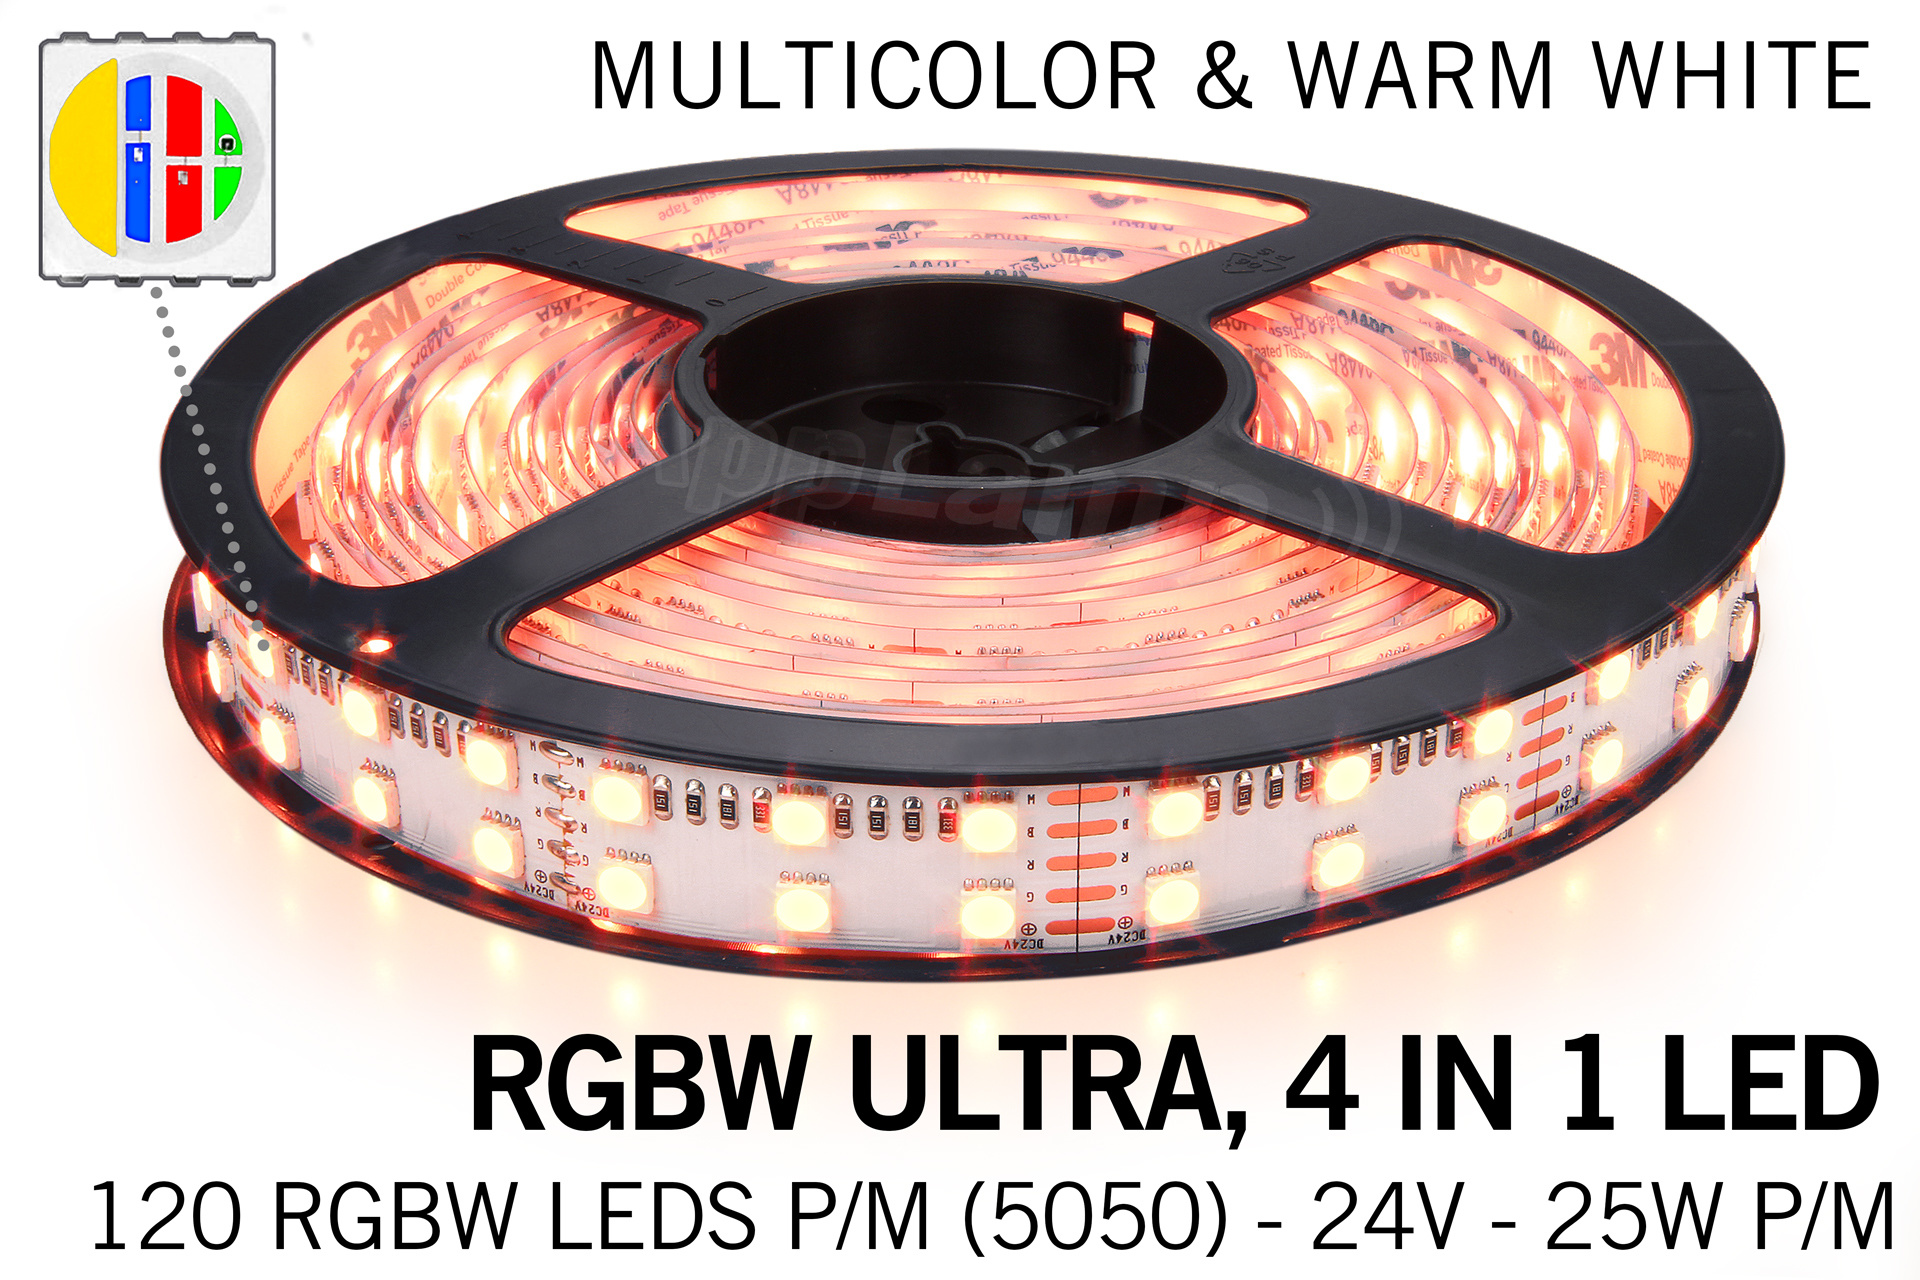 Applamp RGBW ULTRA LED strip dubbele rij 120 LED/m, 4 IN 1 LED